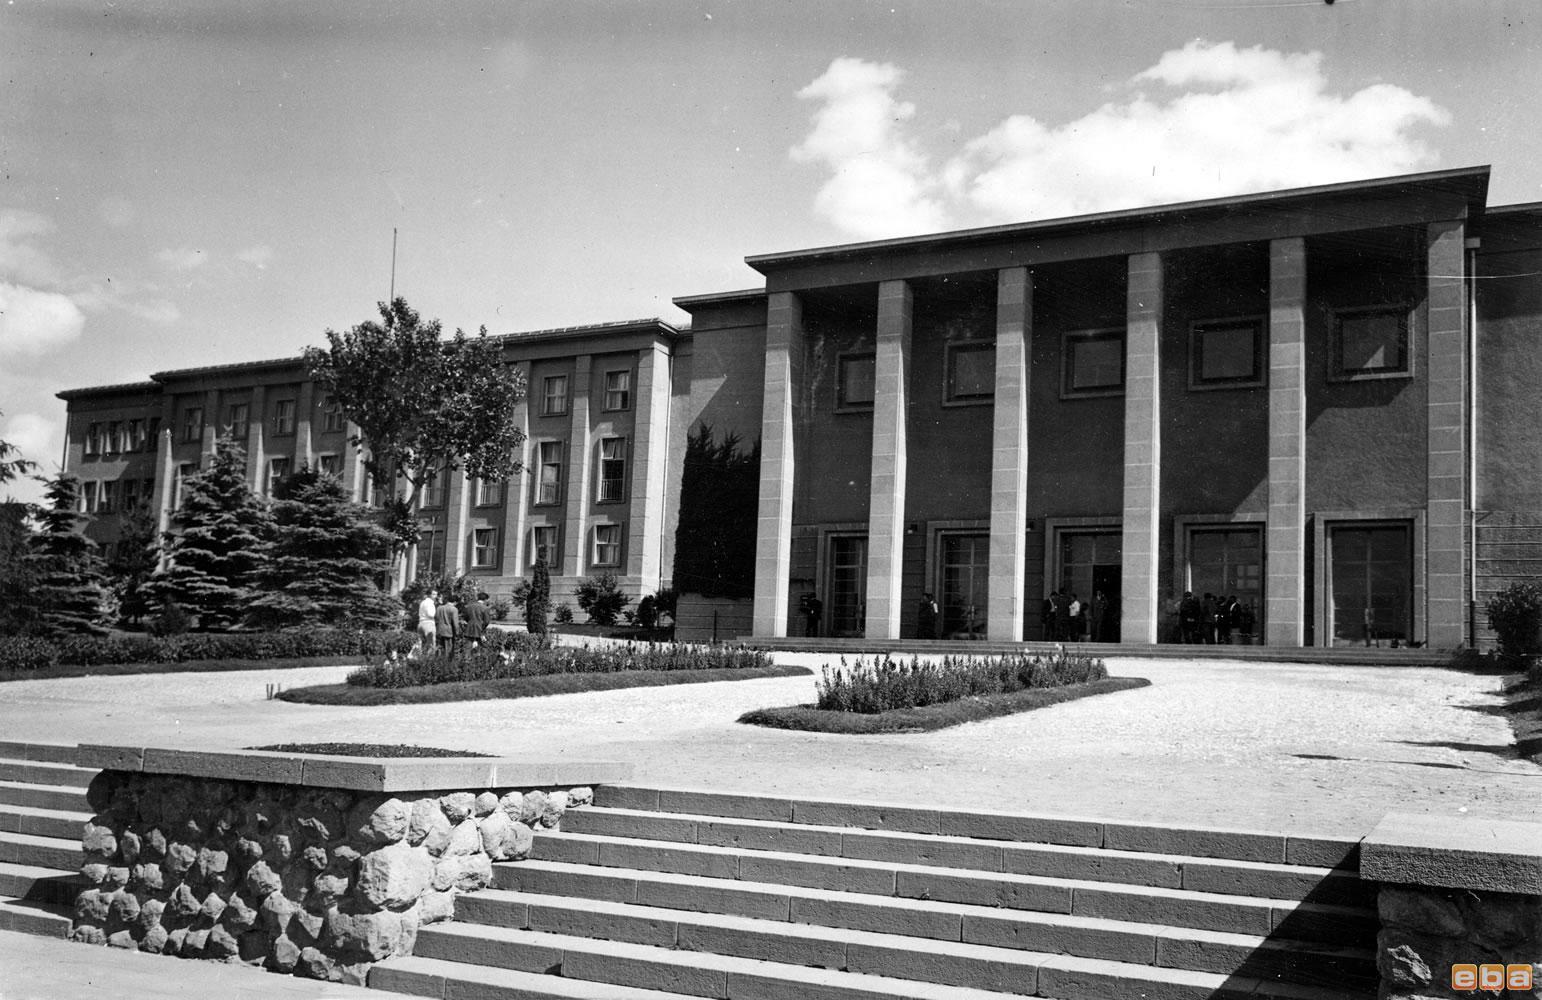 The first university of the Republic of Turkey, Ankara University.